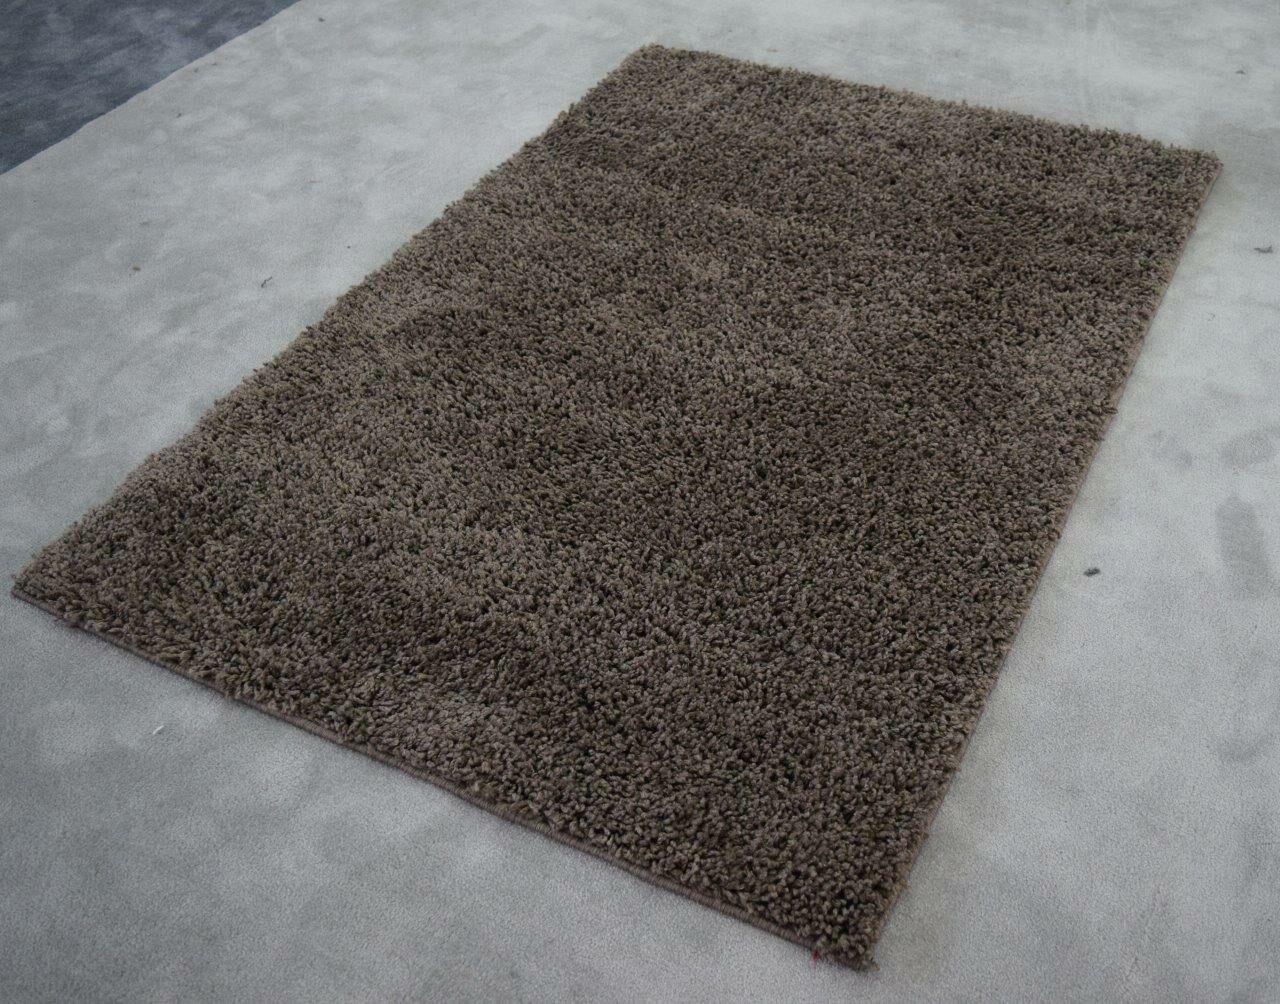 Filson Brown Area Rug Rug Size: Rectangle 5'3